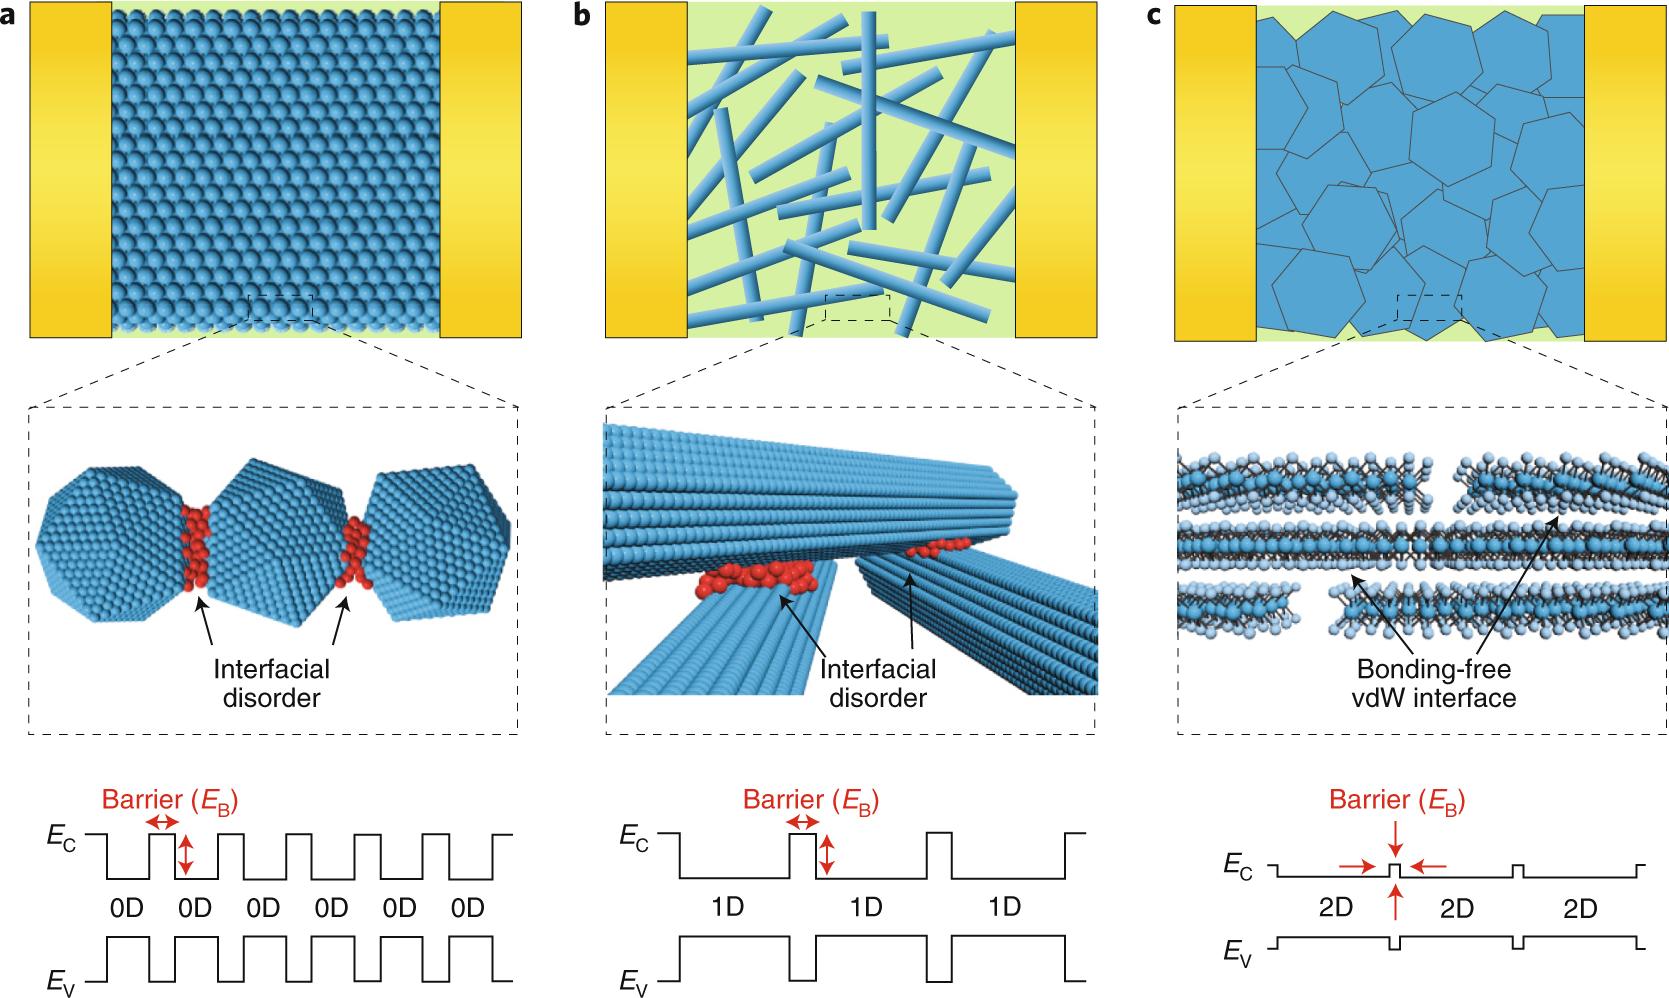 Van der Waals thin-film electronics